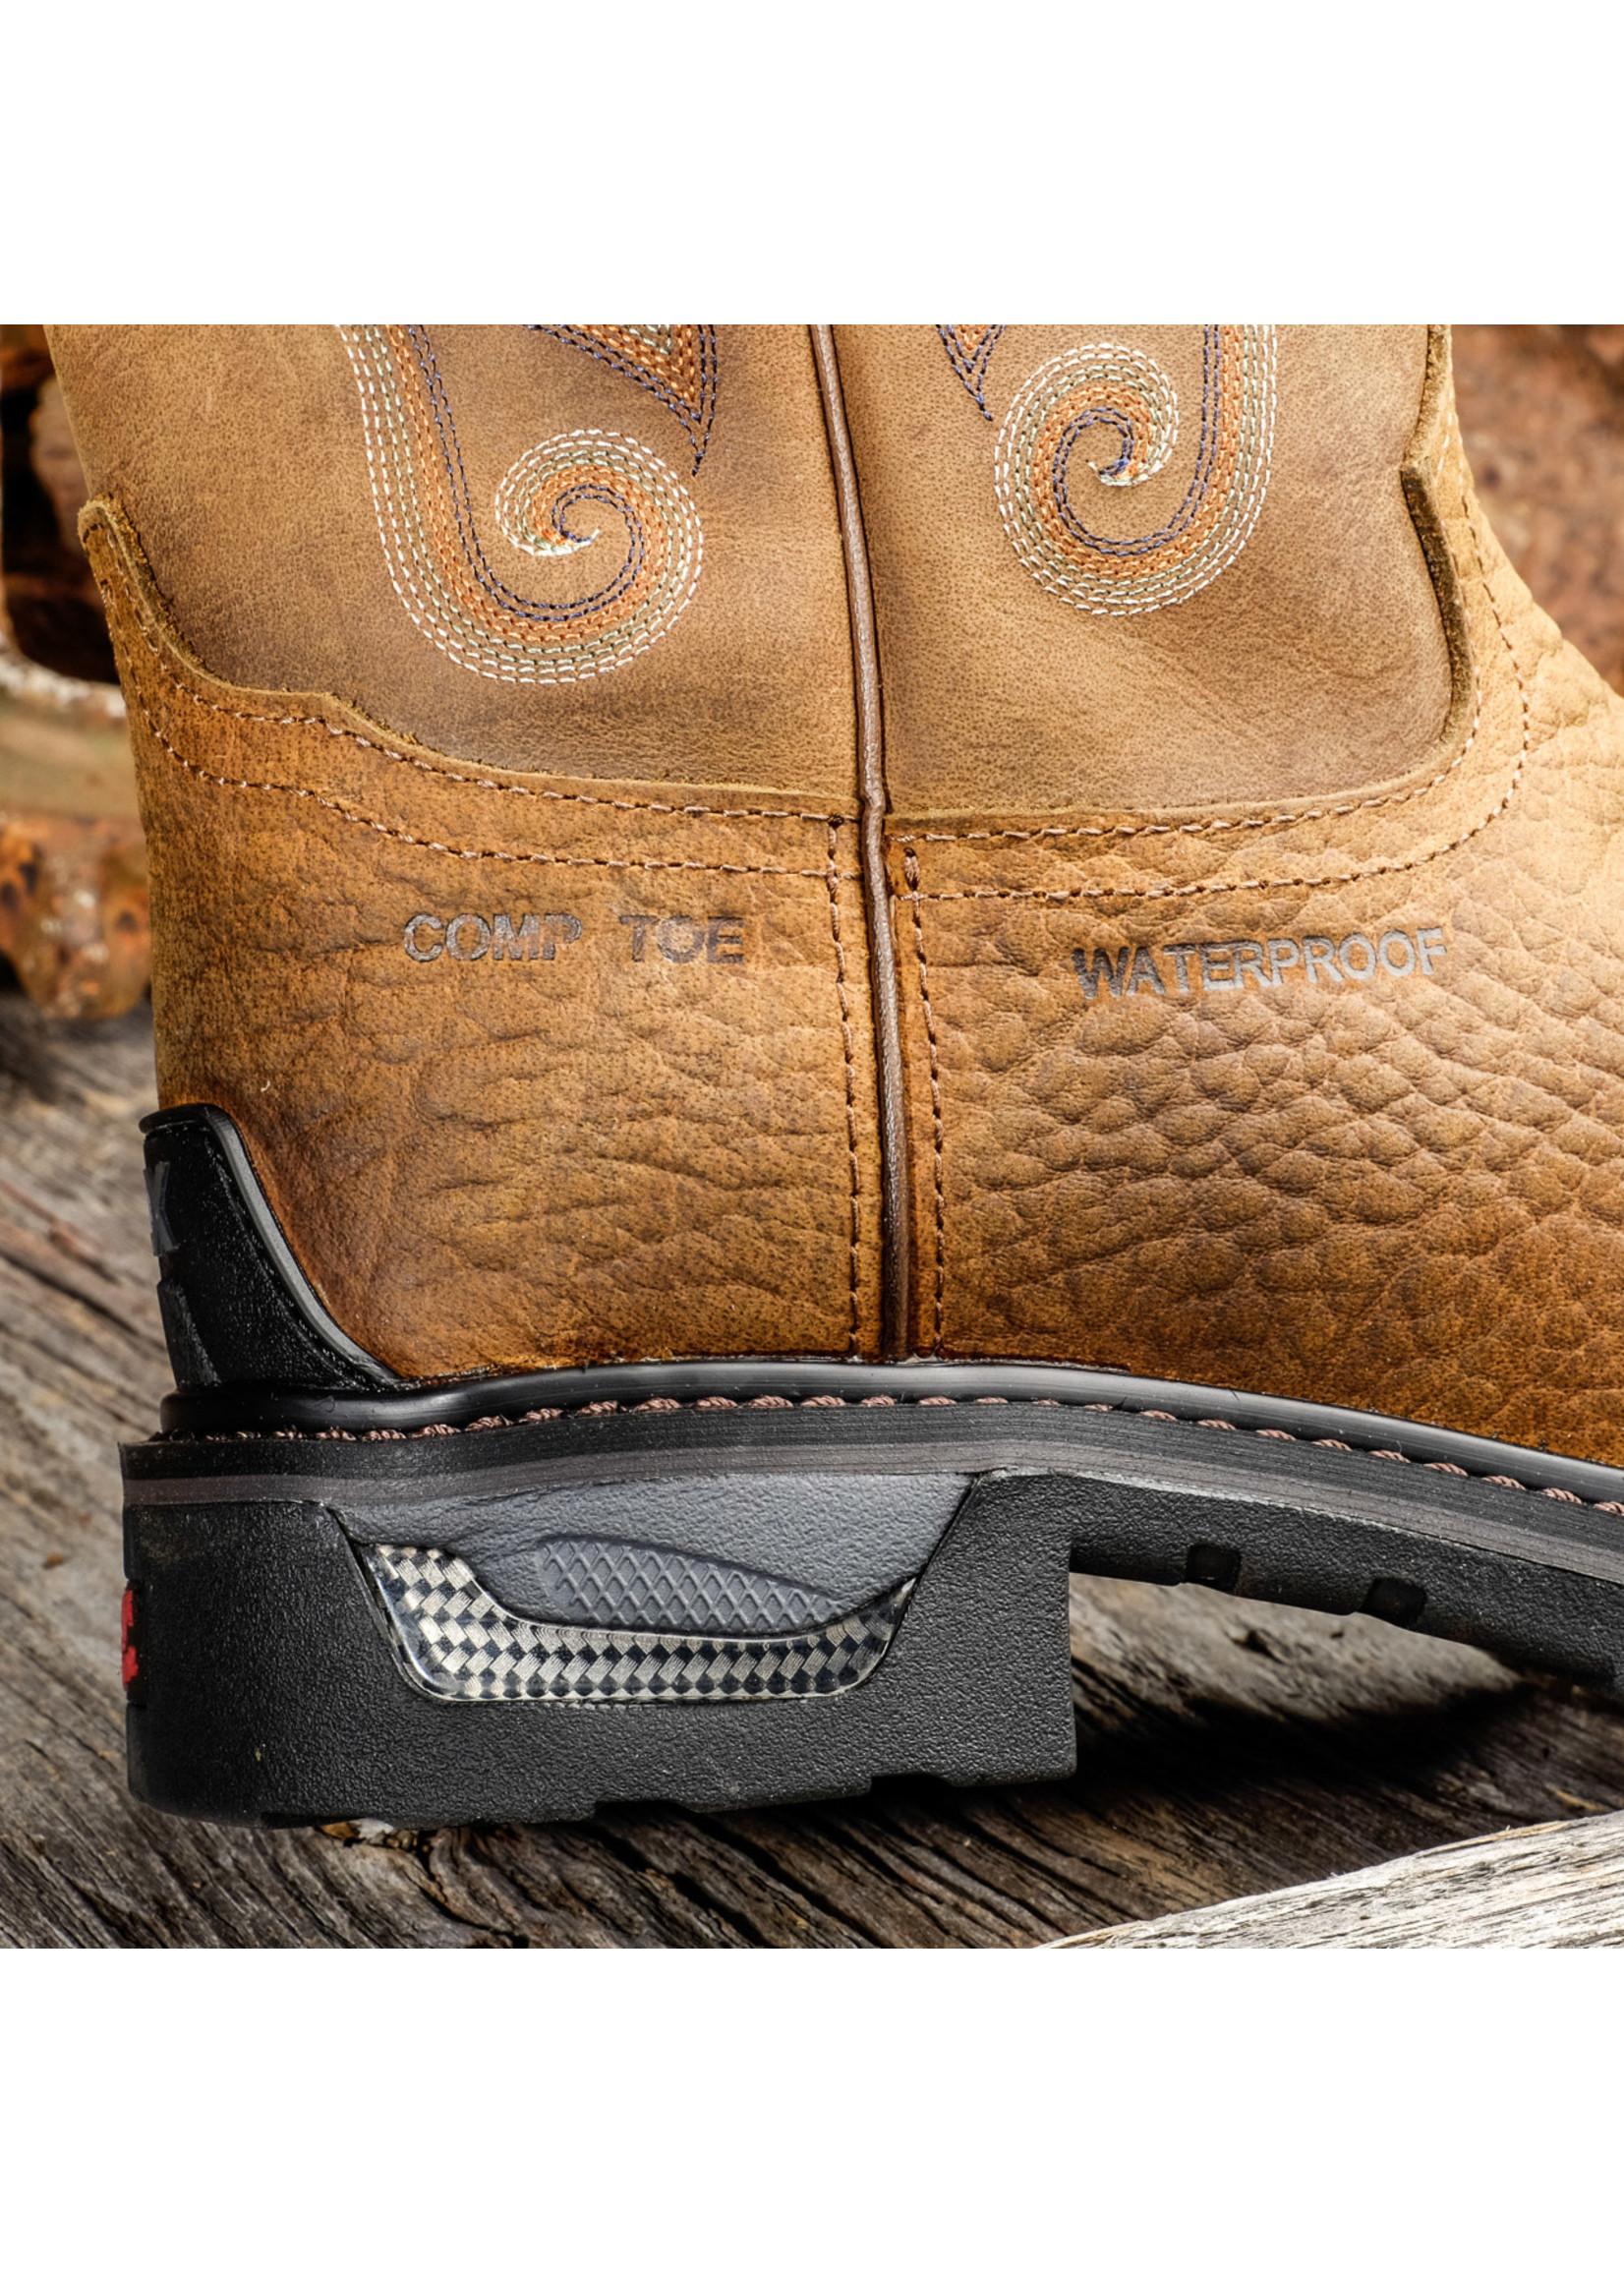 Tony Lama Sierra Badlands Composite Toe Waterproof Work Boots TW4006